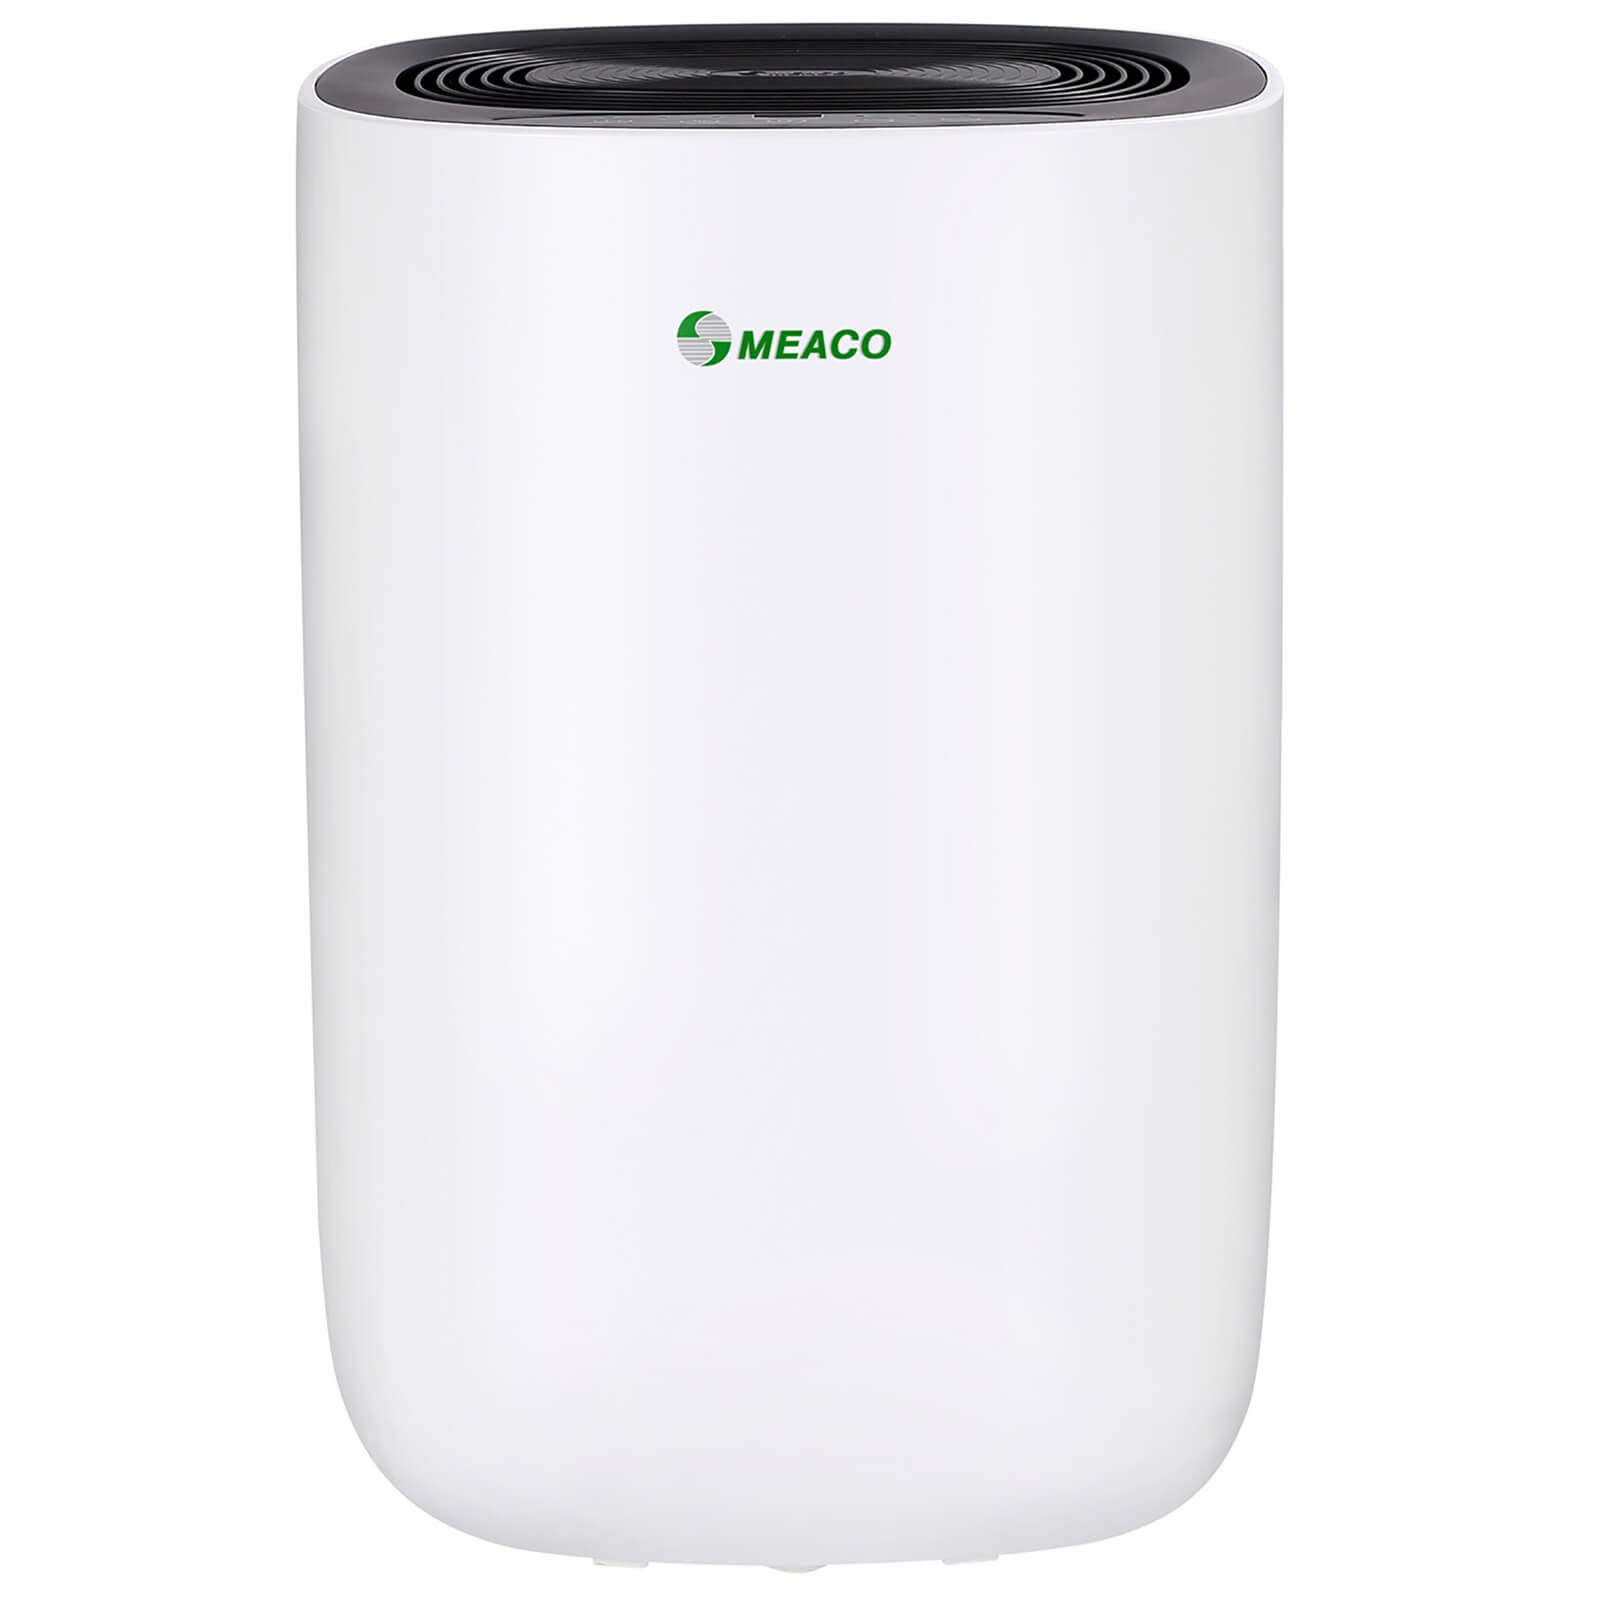 Meaco Dry ABC 12L Dehumidifier - Black